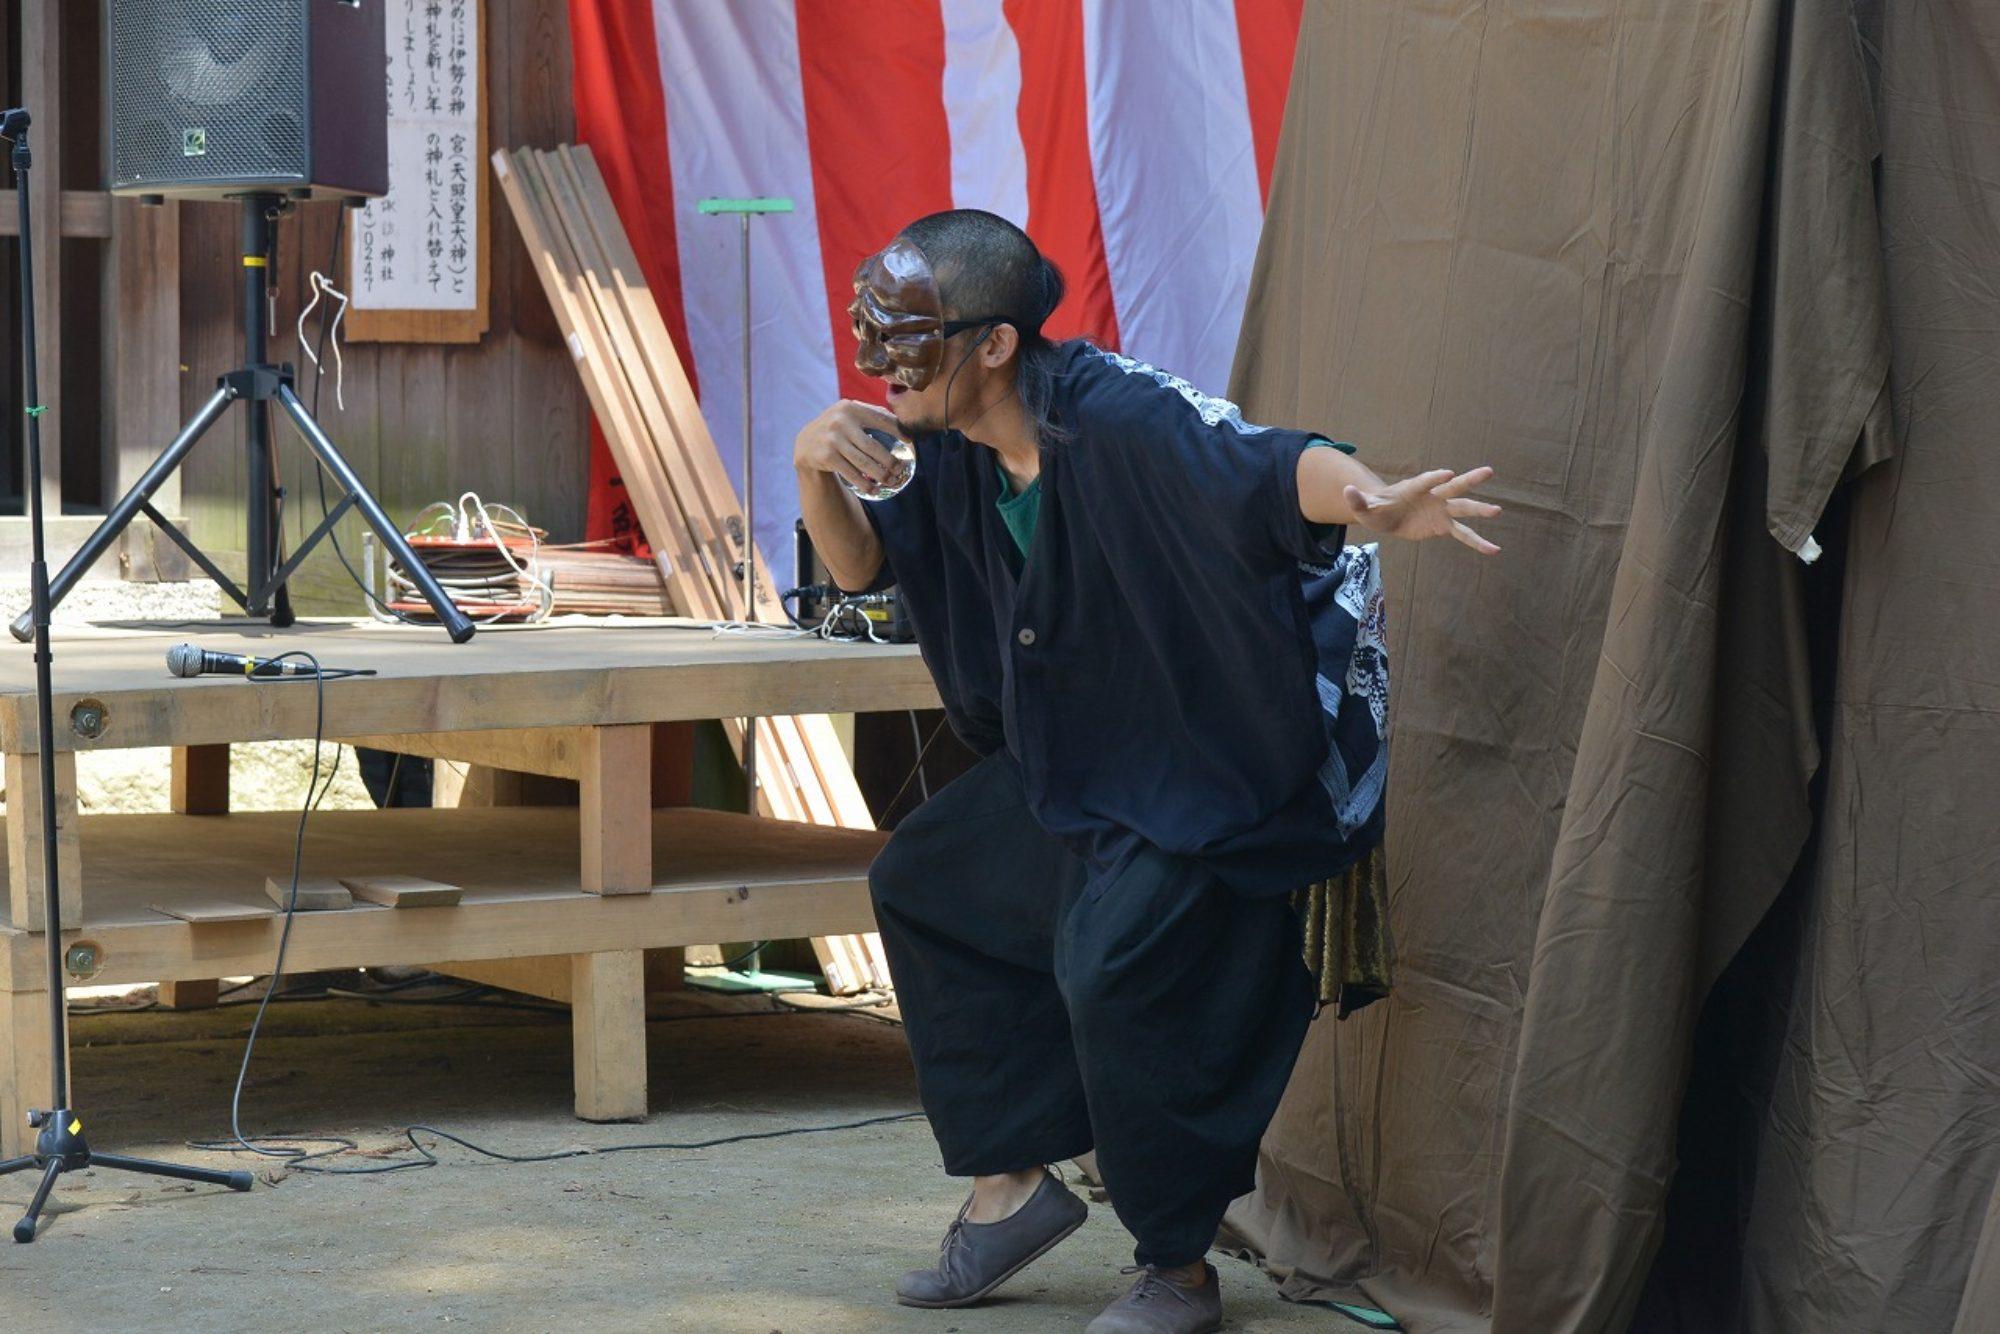 Yogi Chan